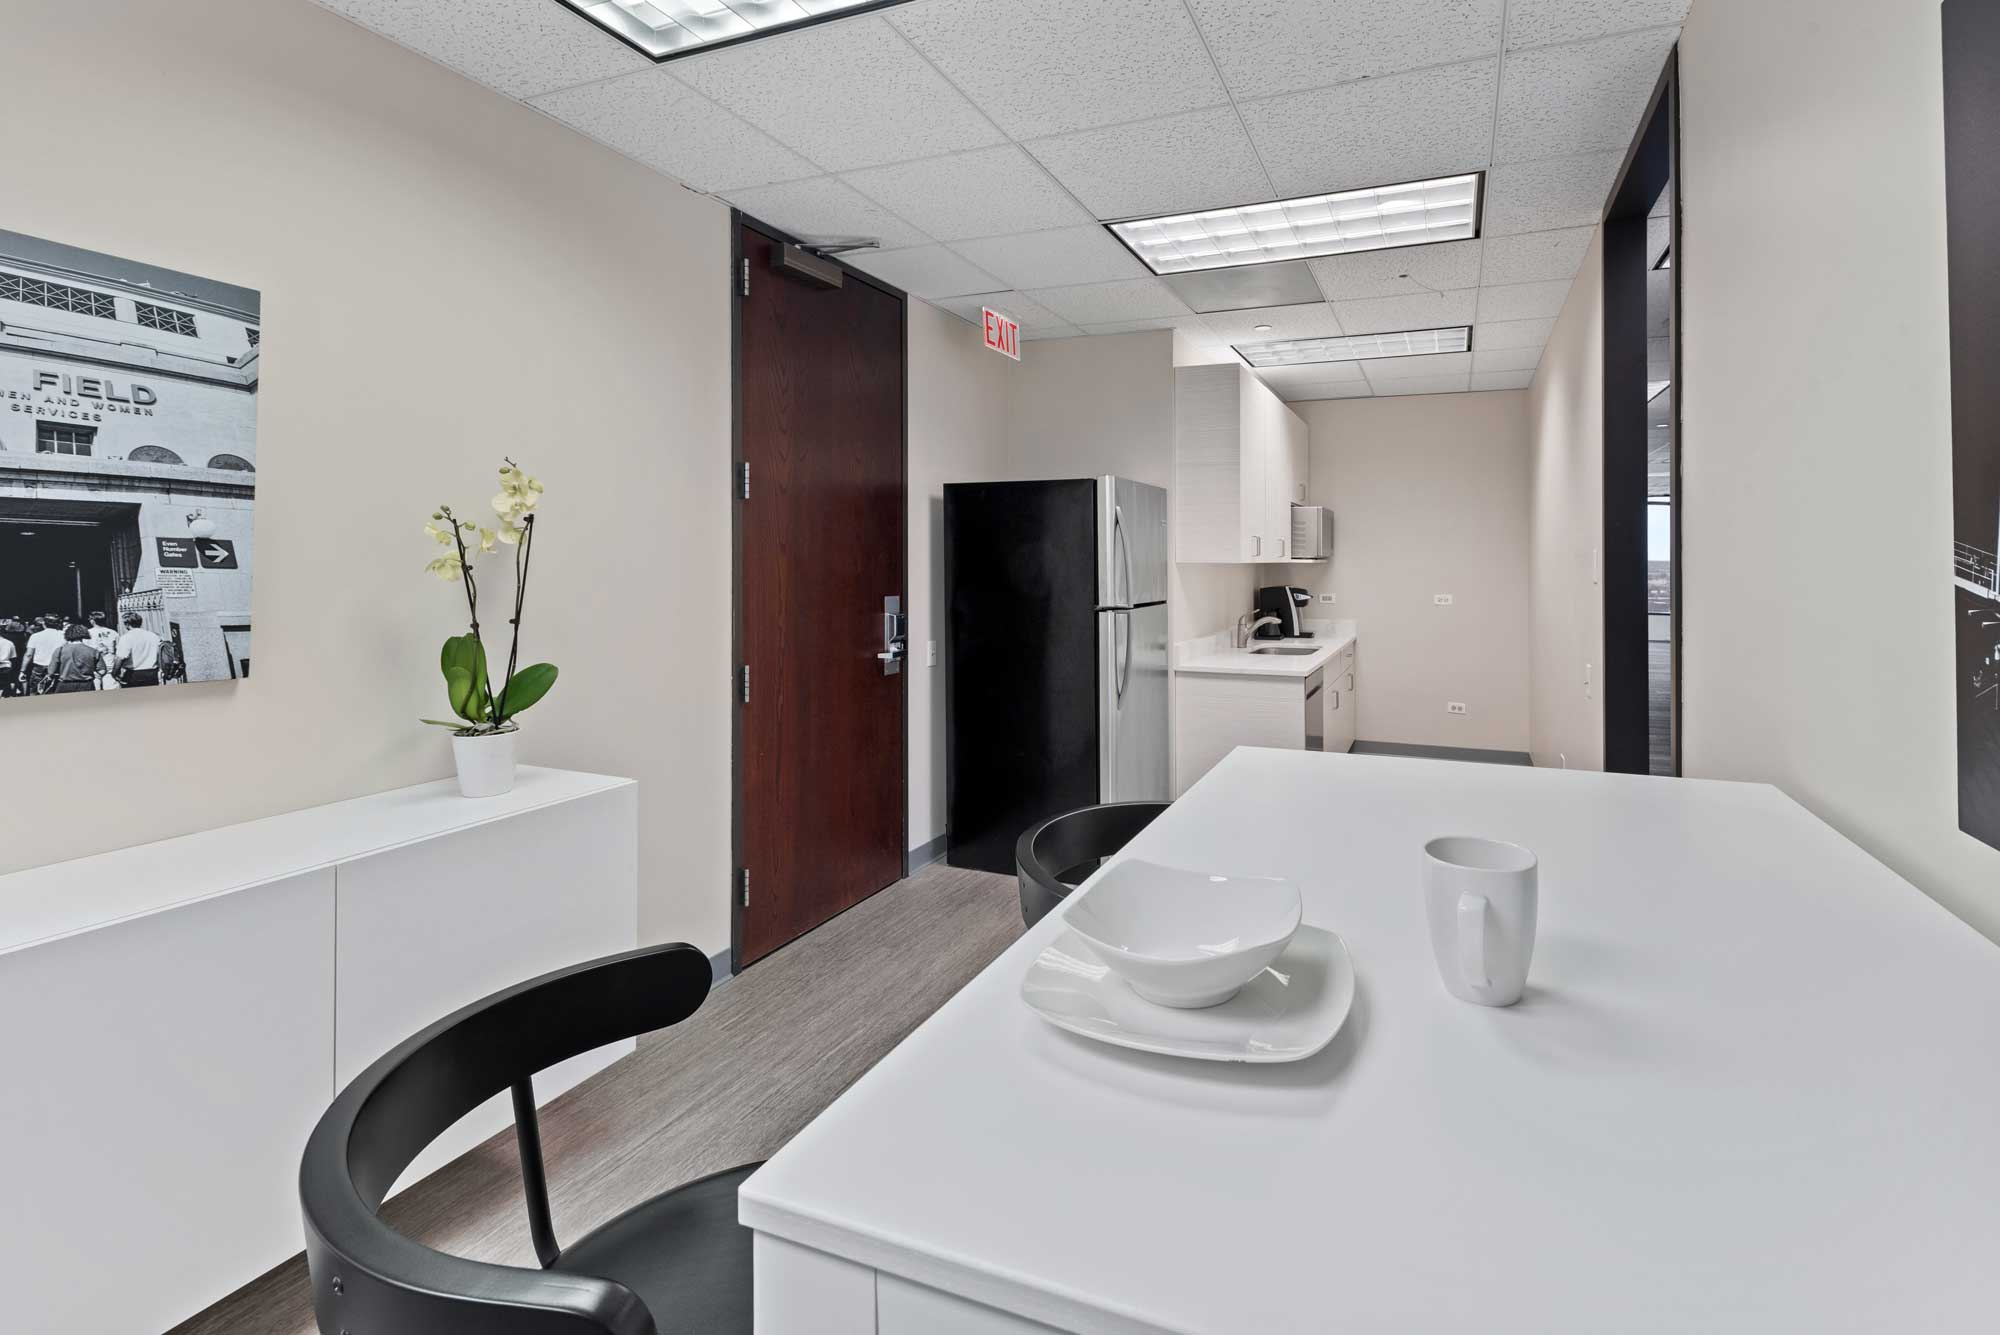 Office Base Chicago Kitchen